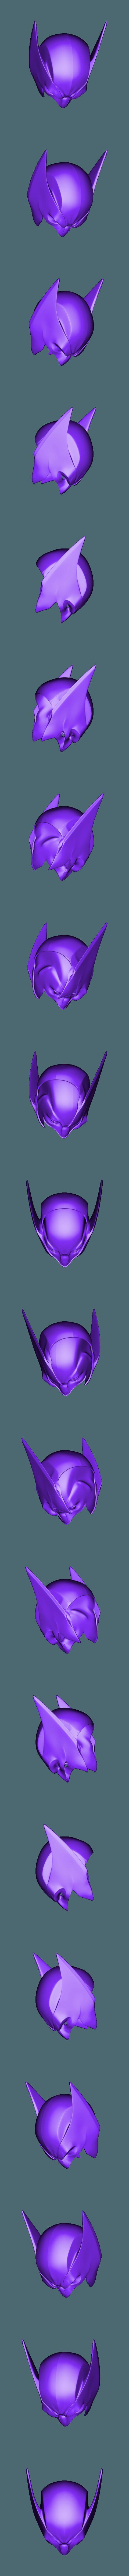 Longear.stl Download STL file Wolverine Mask • 3D printable model, VillainousPropShop